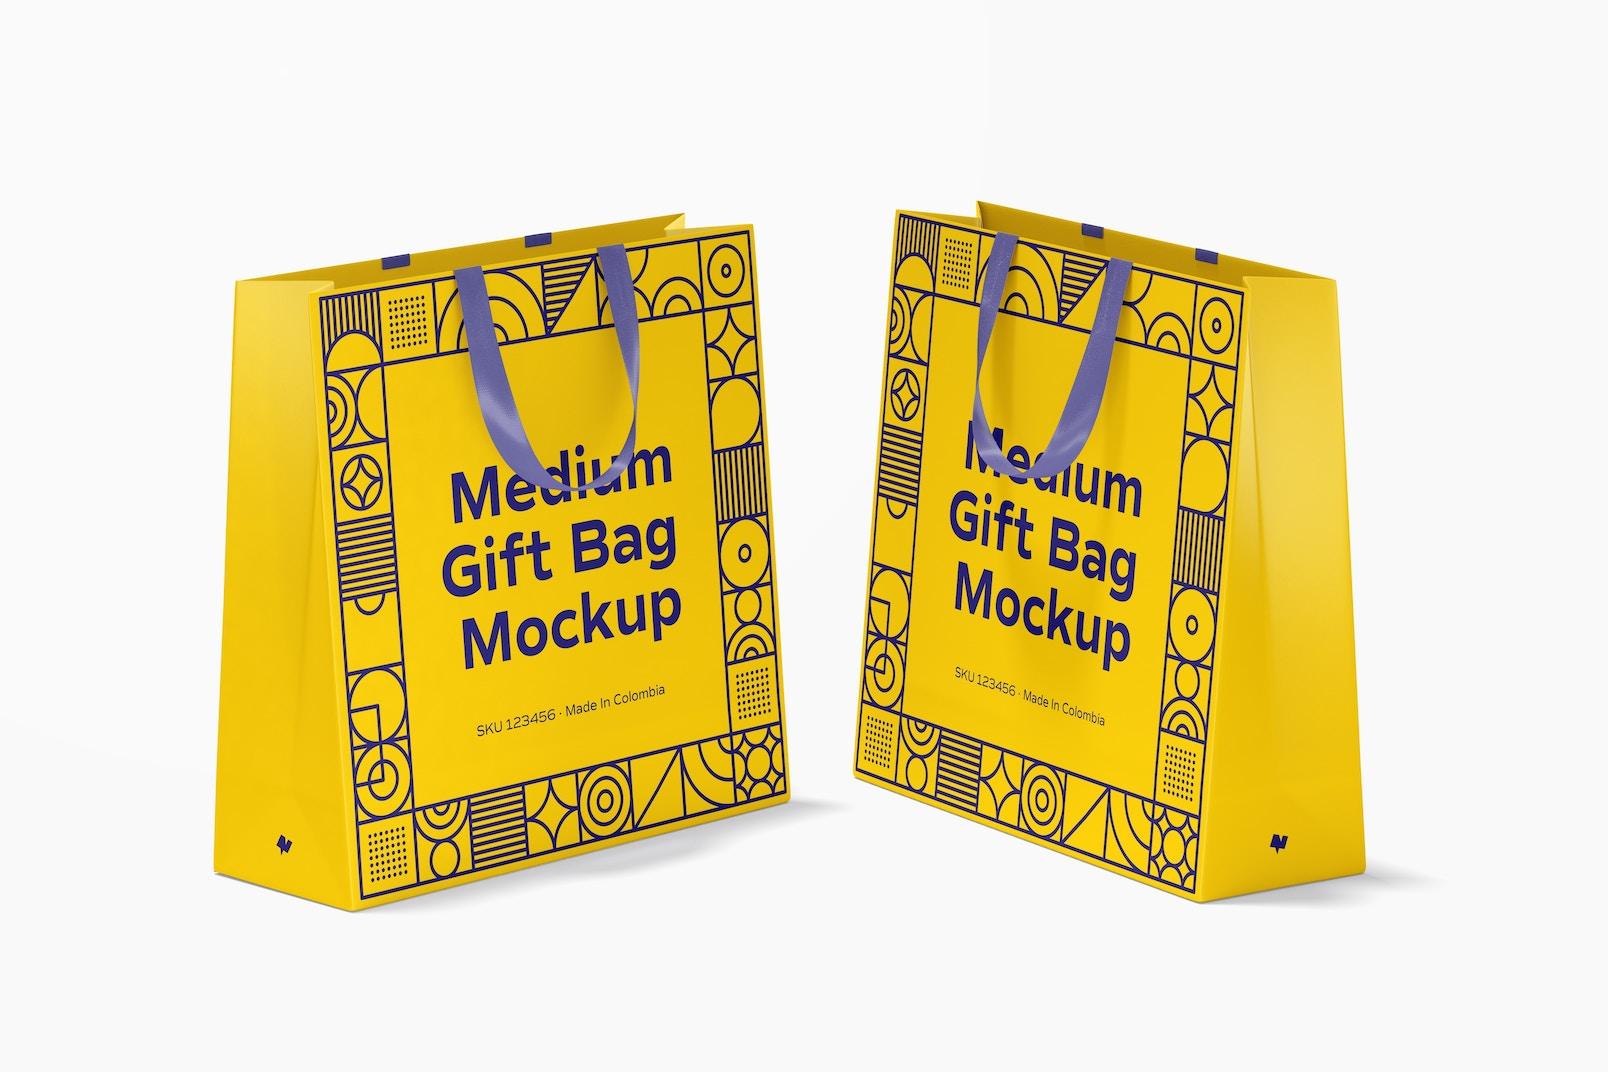 Medium Gift Bags with Ribbon Handle Mockup, Perspective